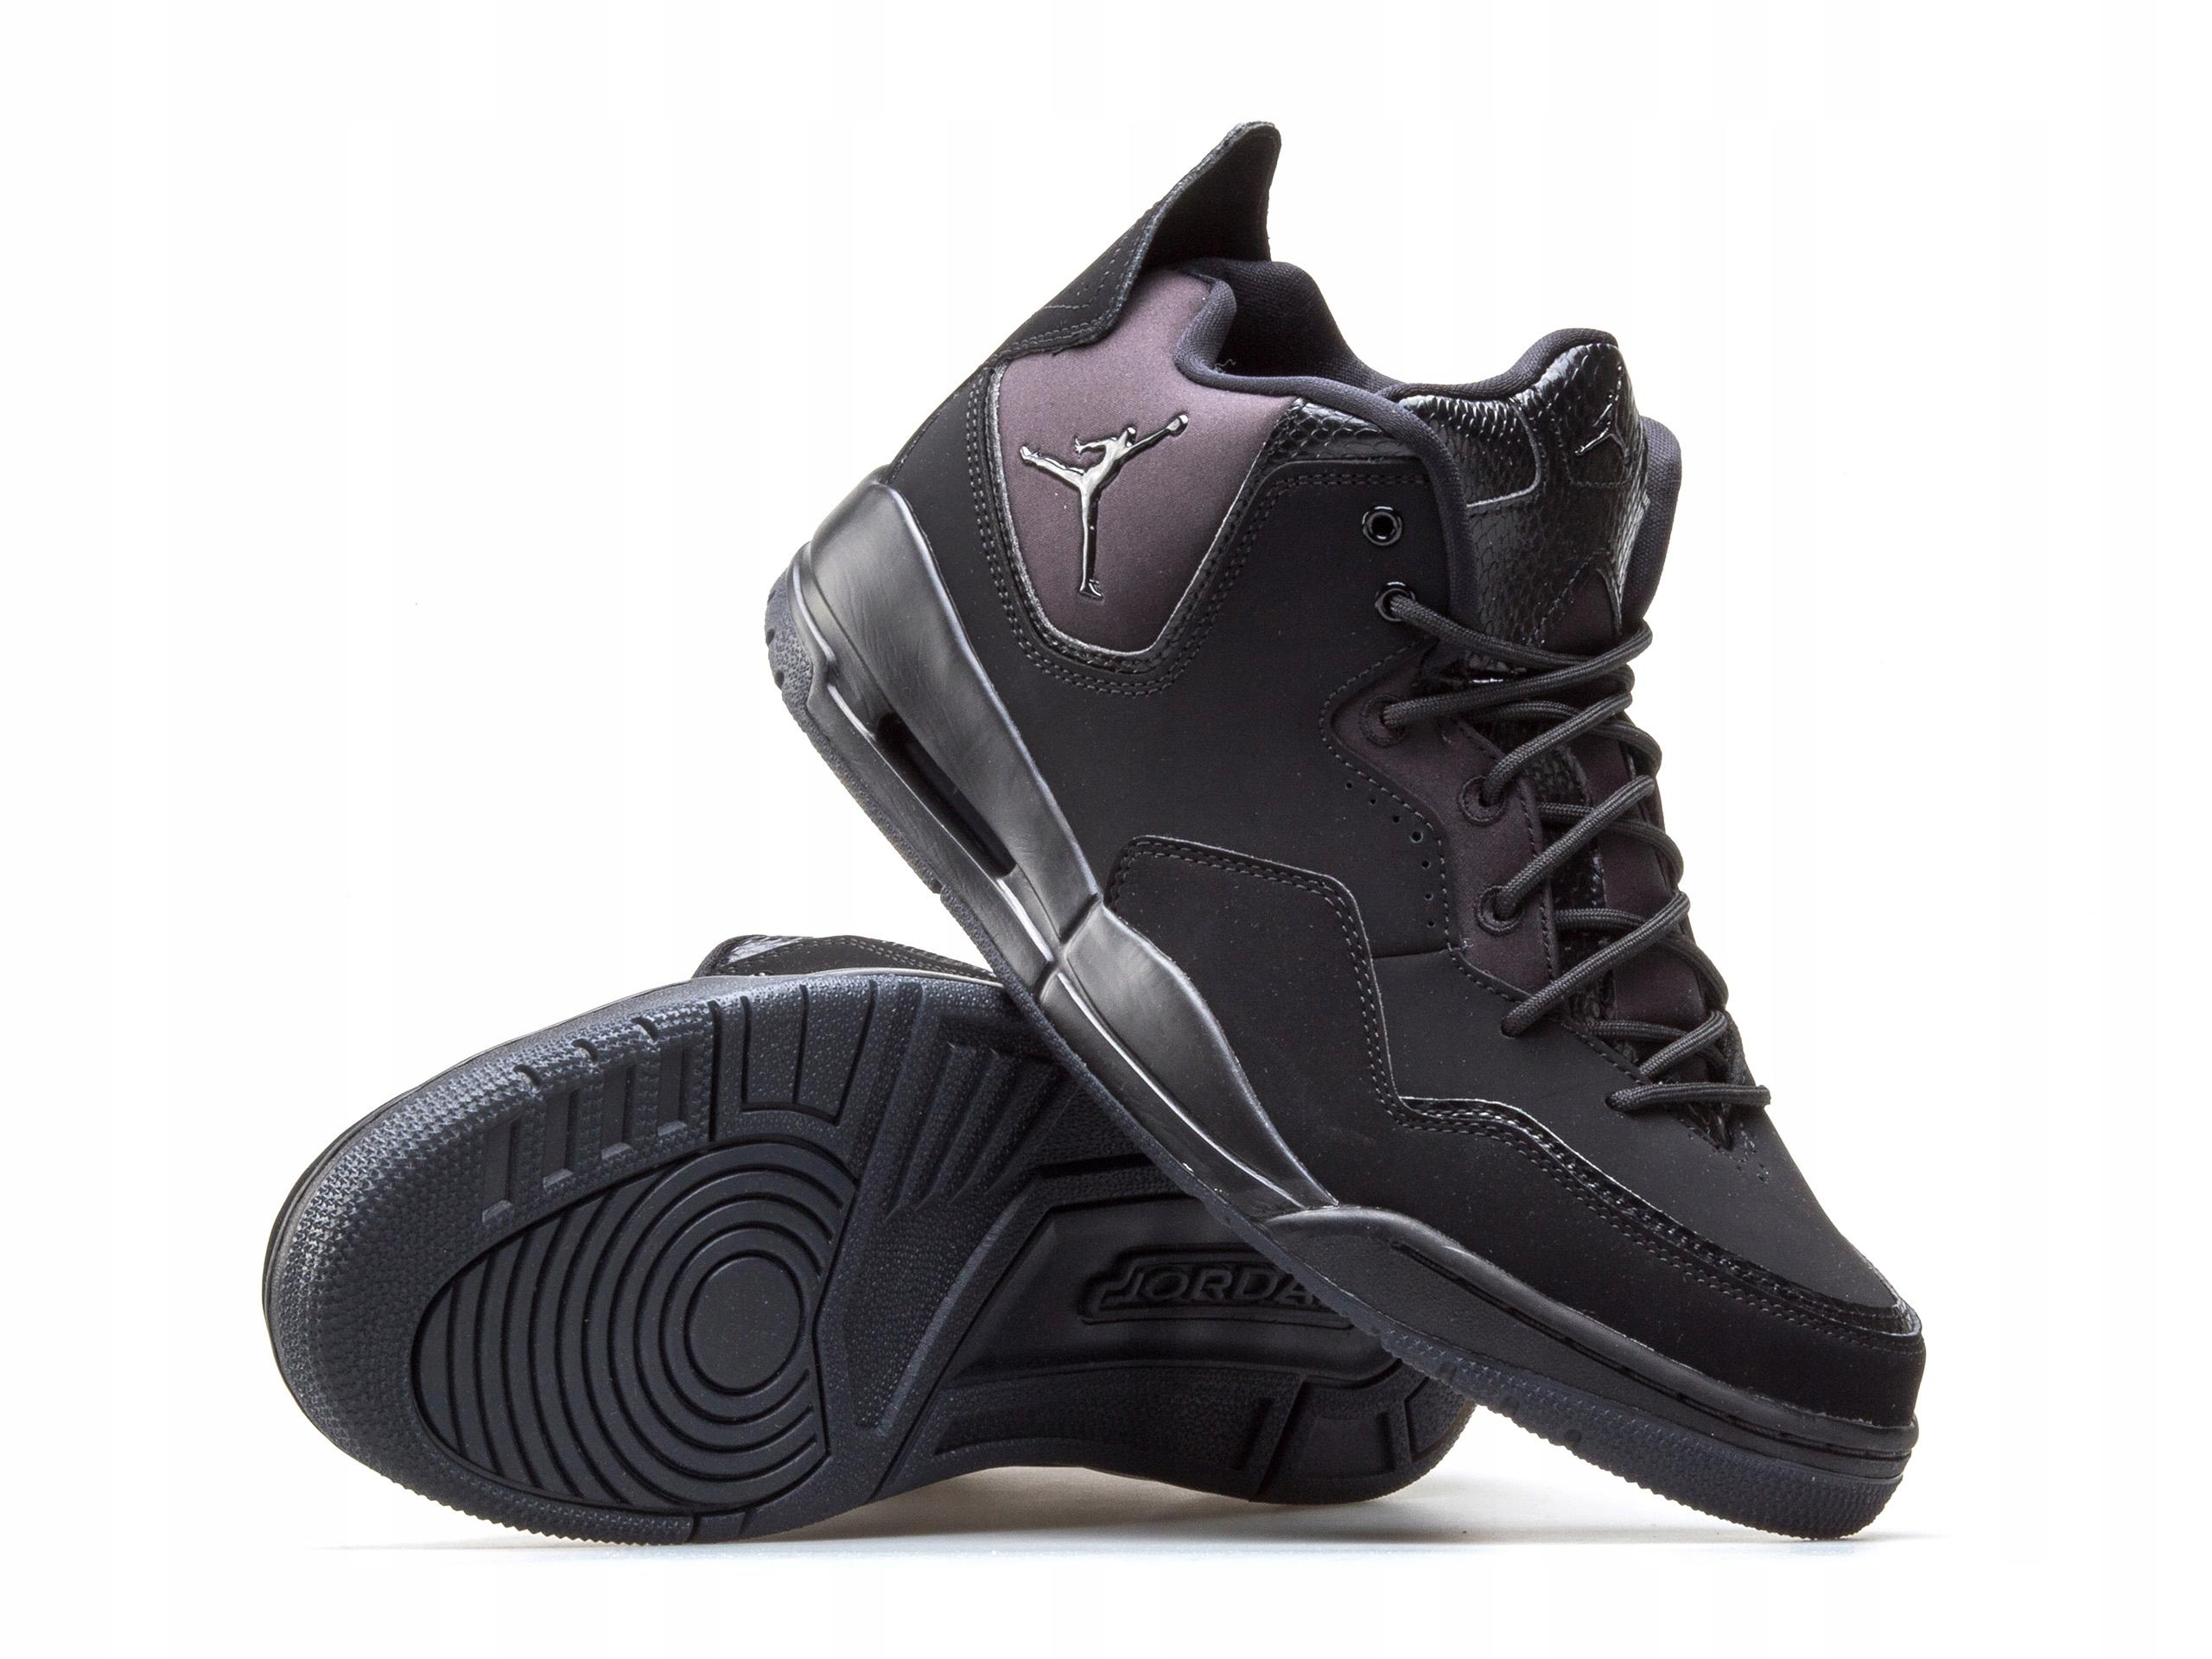 Buty Nike JORDAN COURTSIDE 23 AR1000 001 42 7547939836